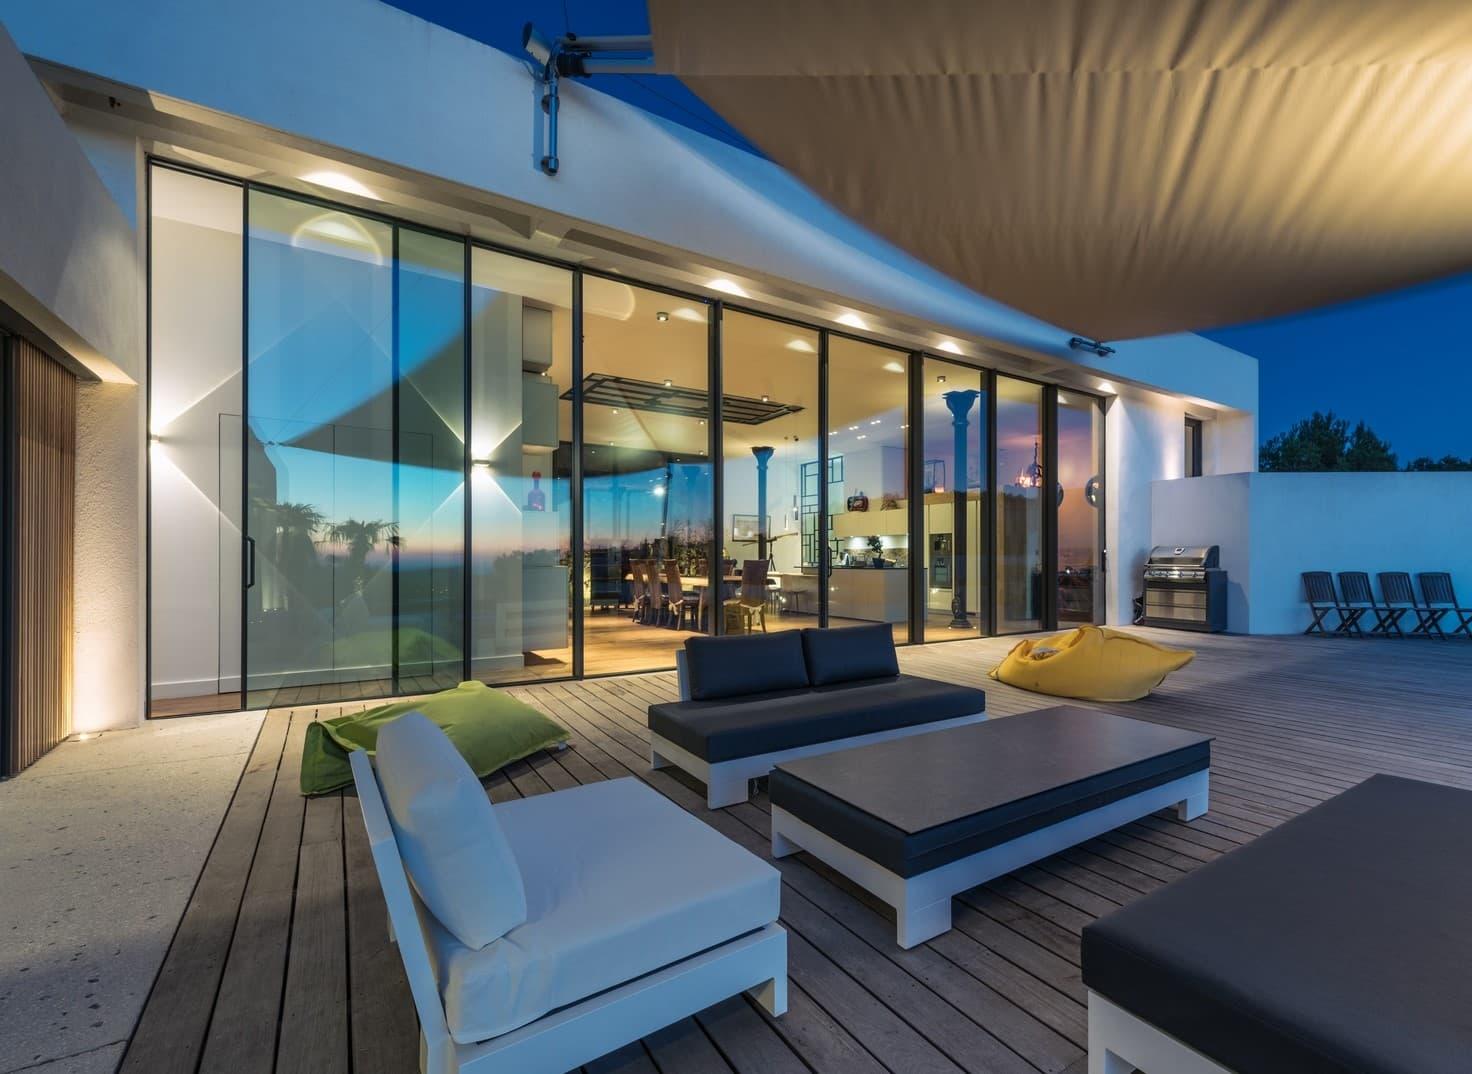 Eclairage de la terrasse de la villa privée Tango